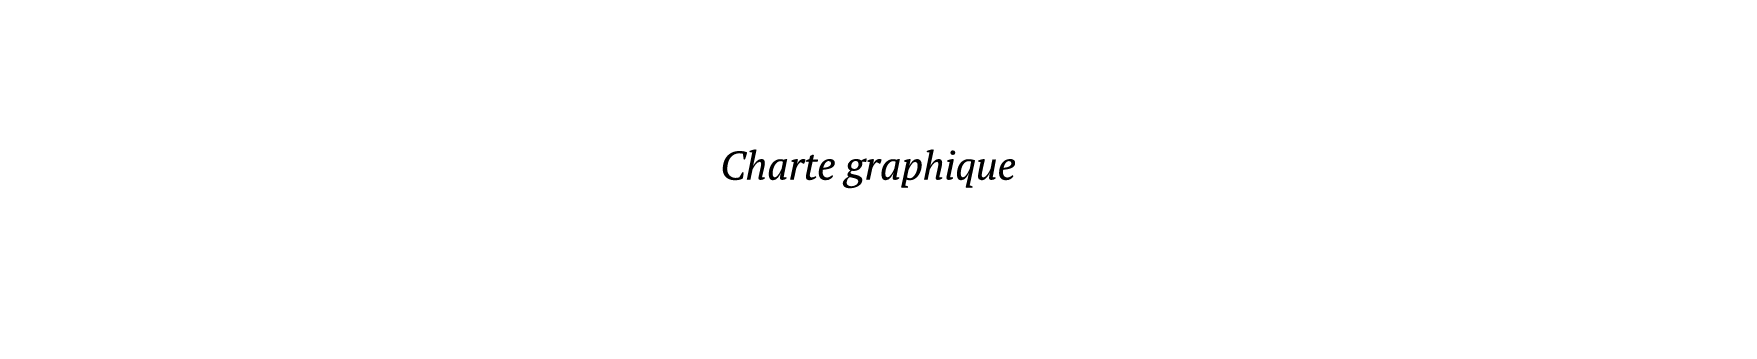 dejboxIllus-copie-4